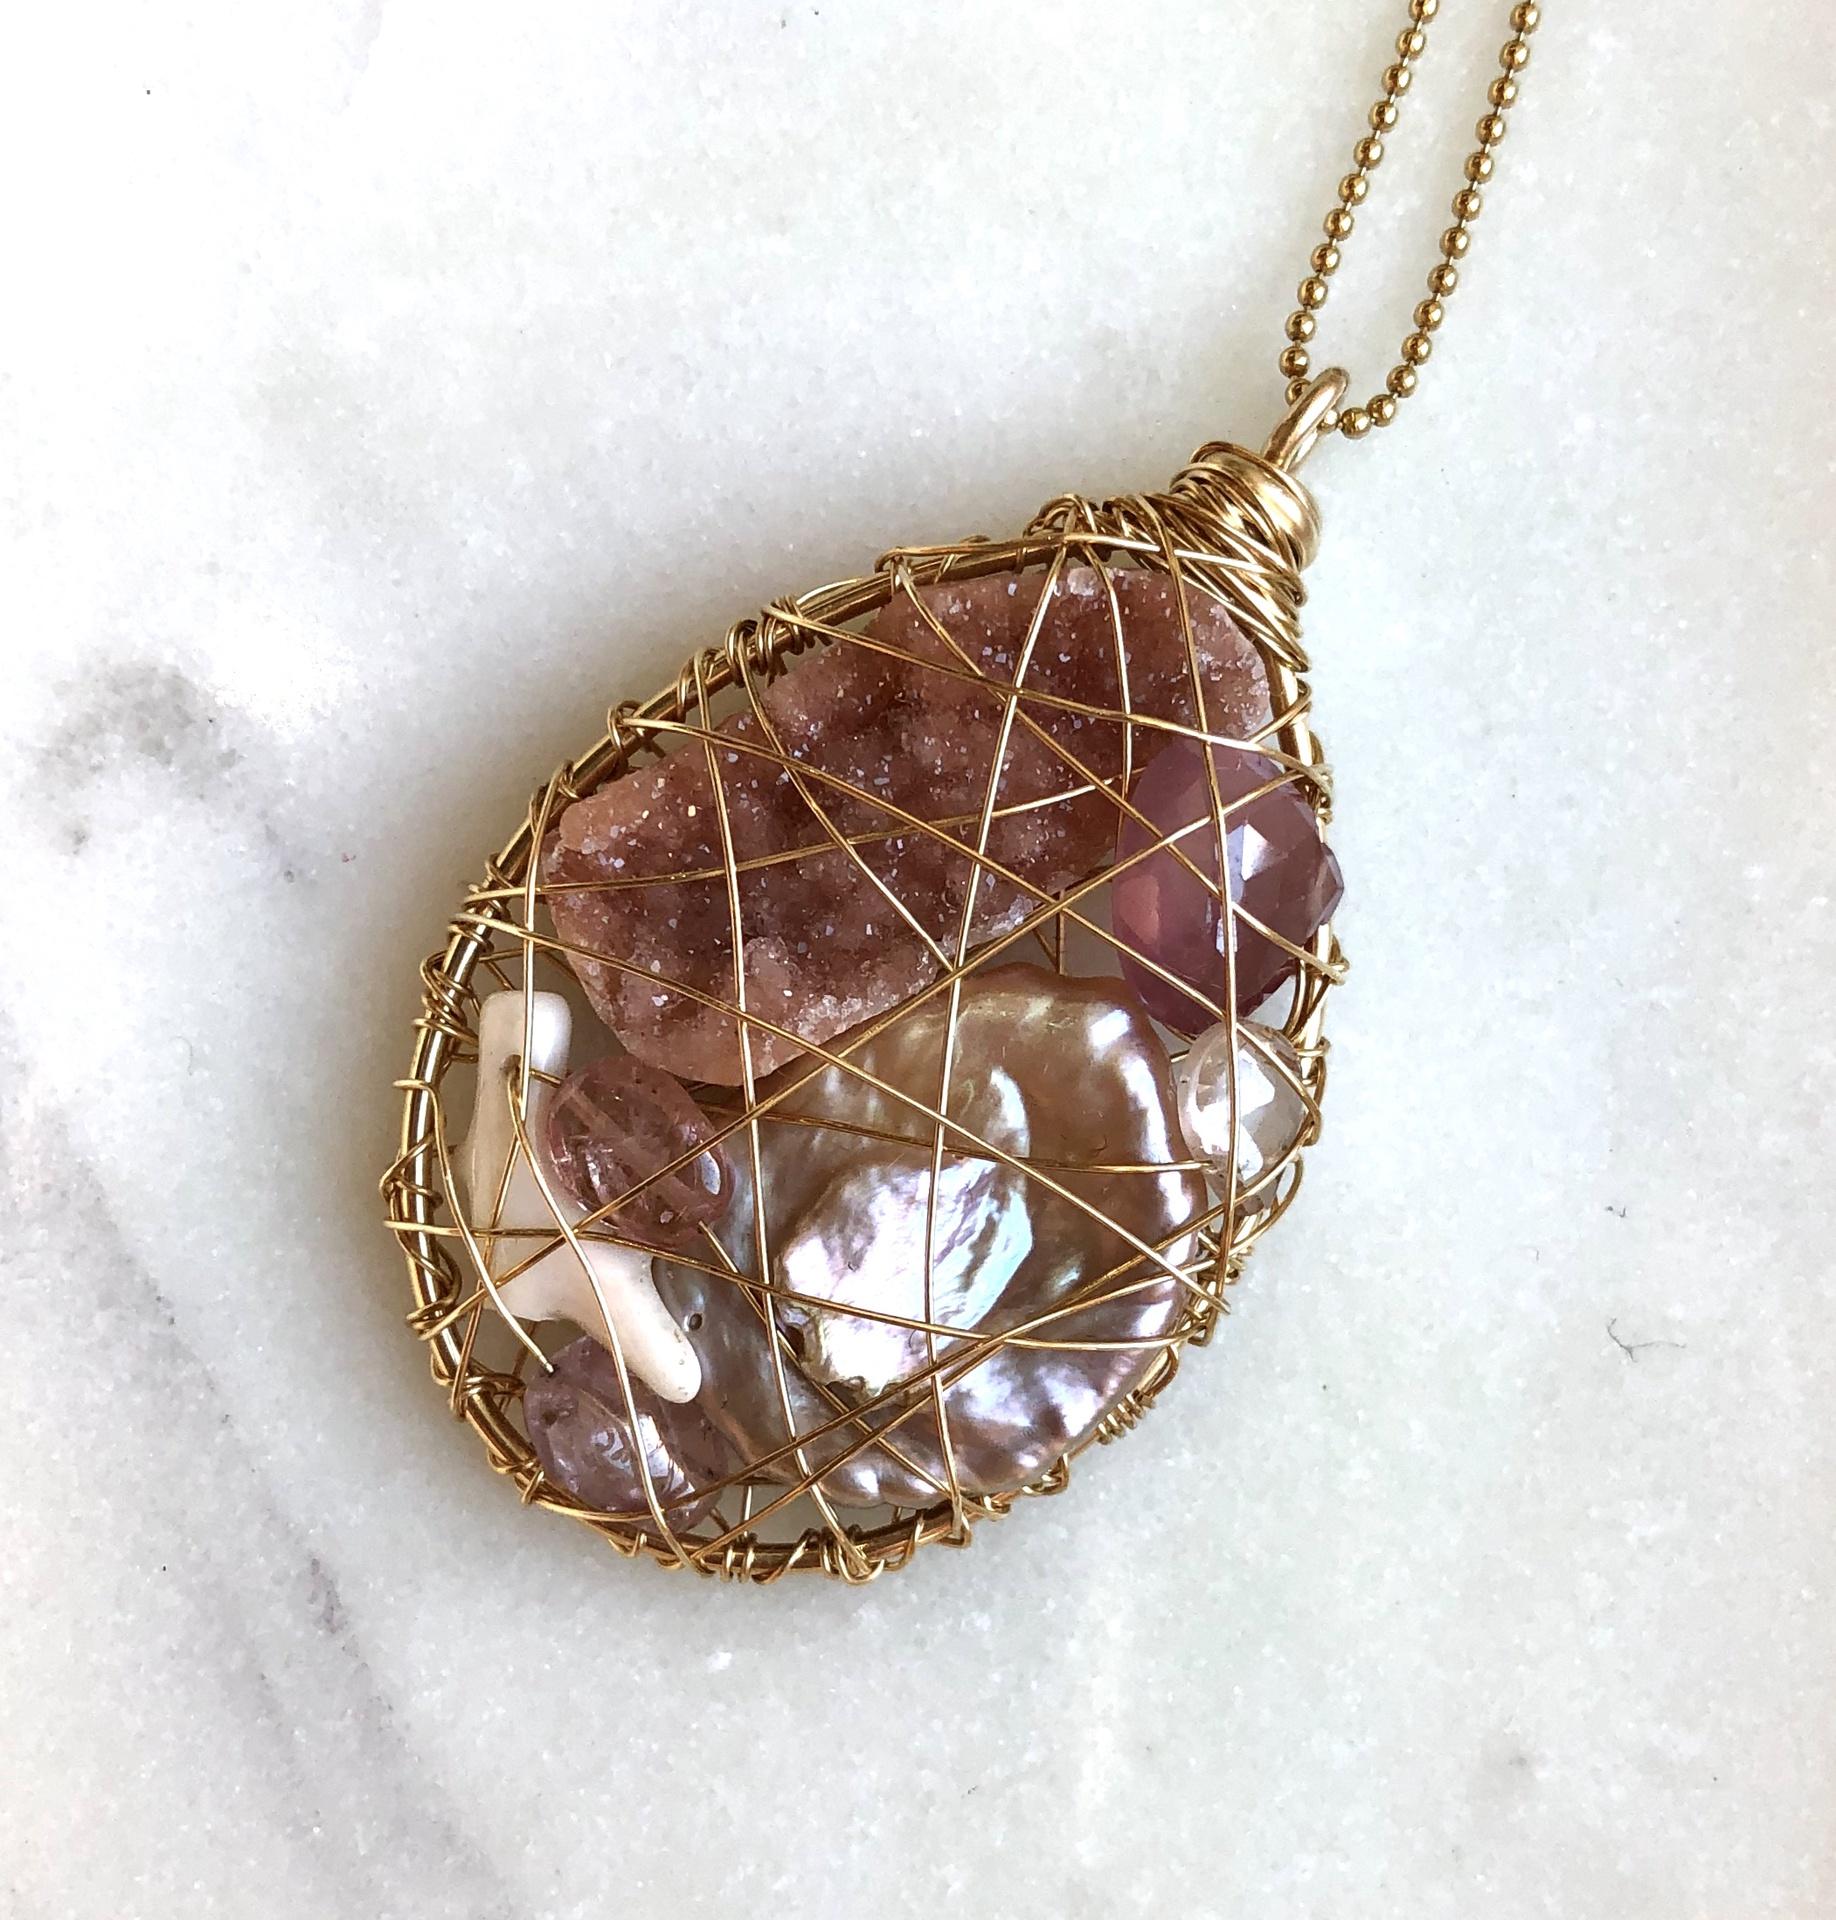 Treasure Necklace w/ Coral, Rose Quartz, Druzy Keshi